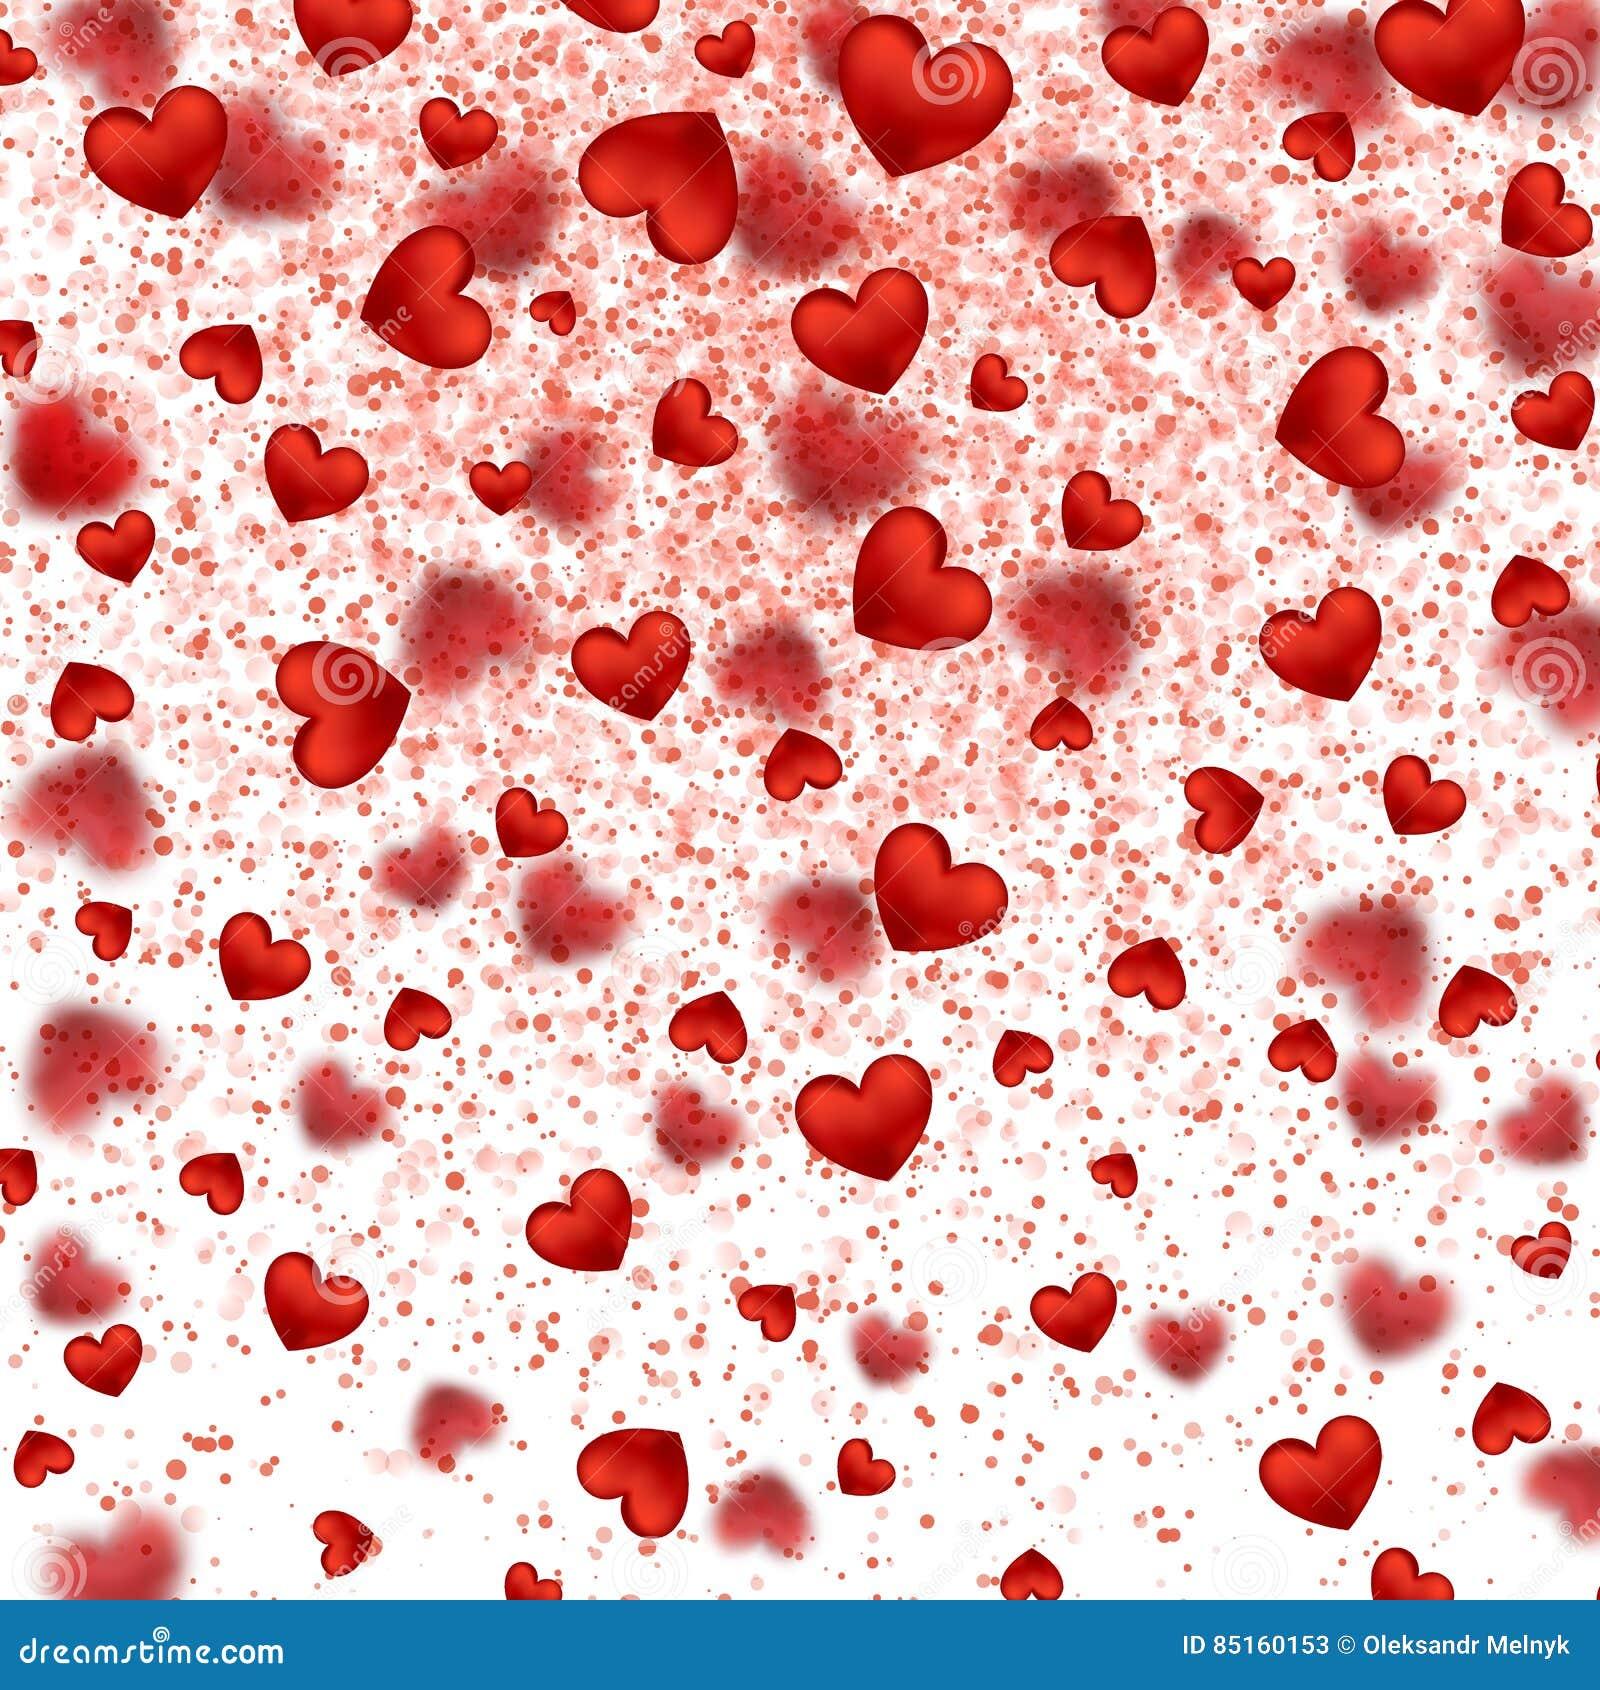 28c660d4 Shimmer sparkle Frame Border Confetti Greeting Valentine`s day card. Love  Decor Festive Bright Glitter Placer. Vector Illustration on white  background.